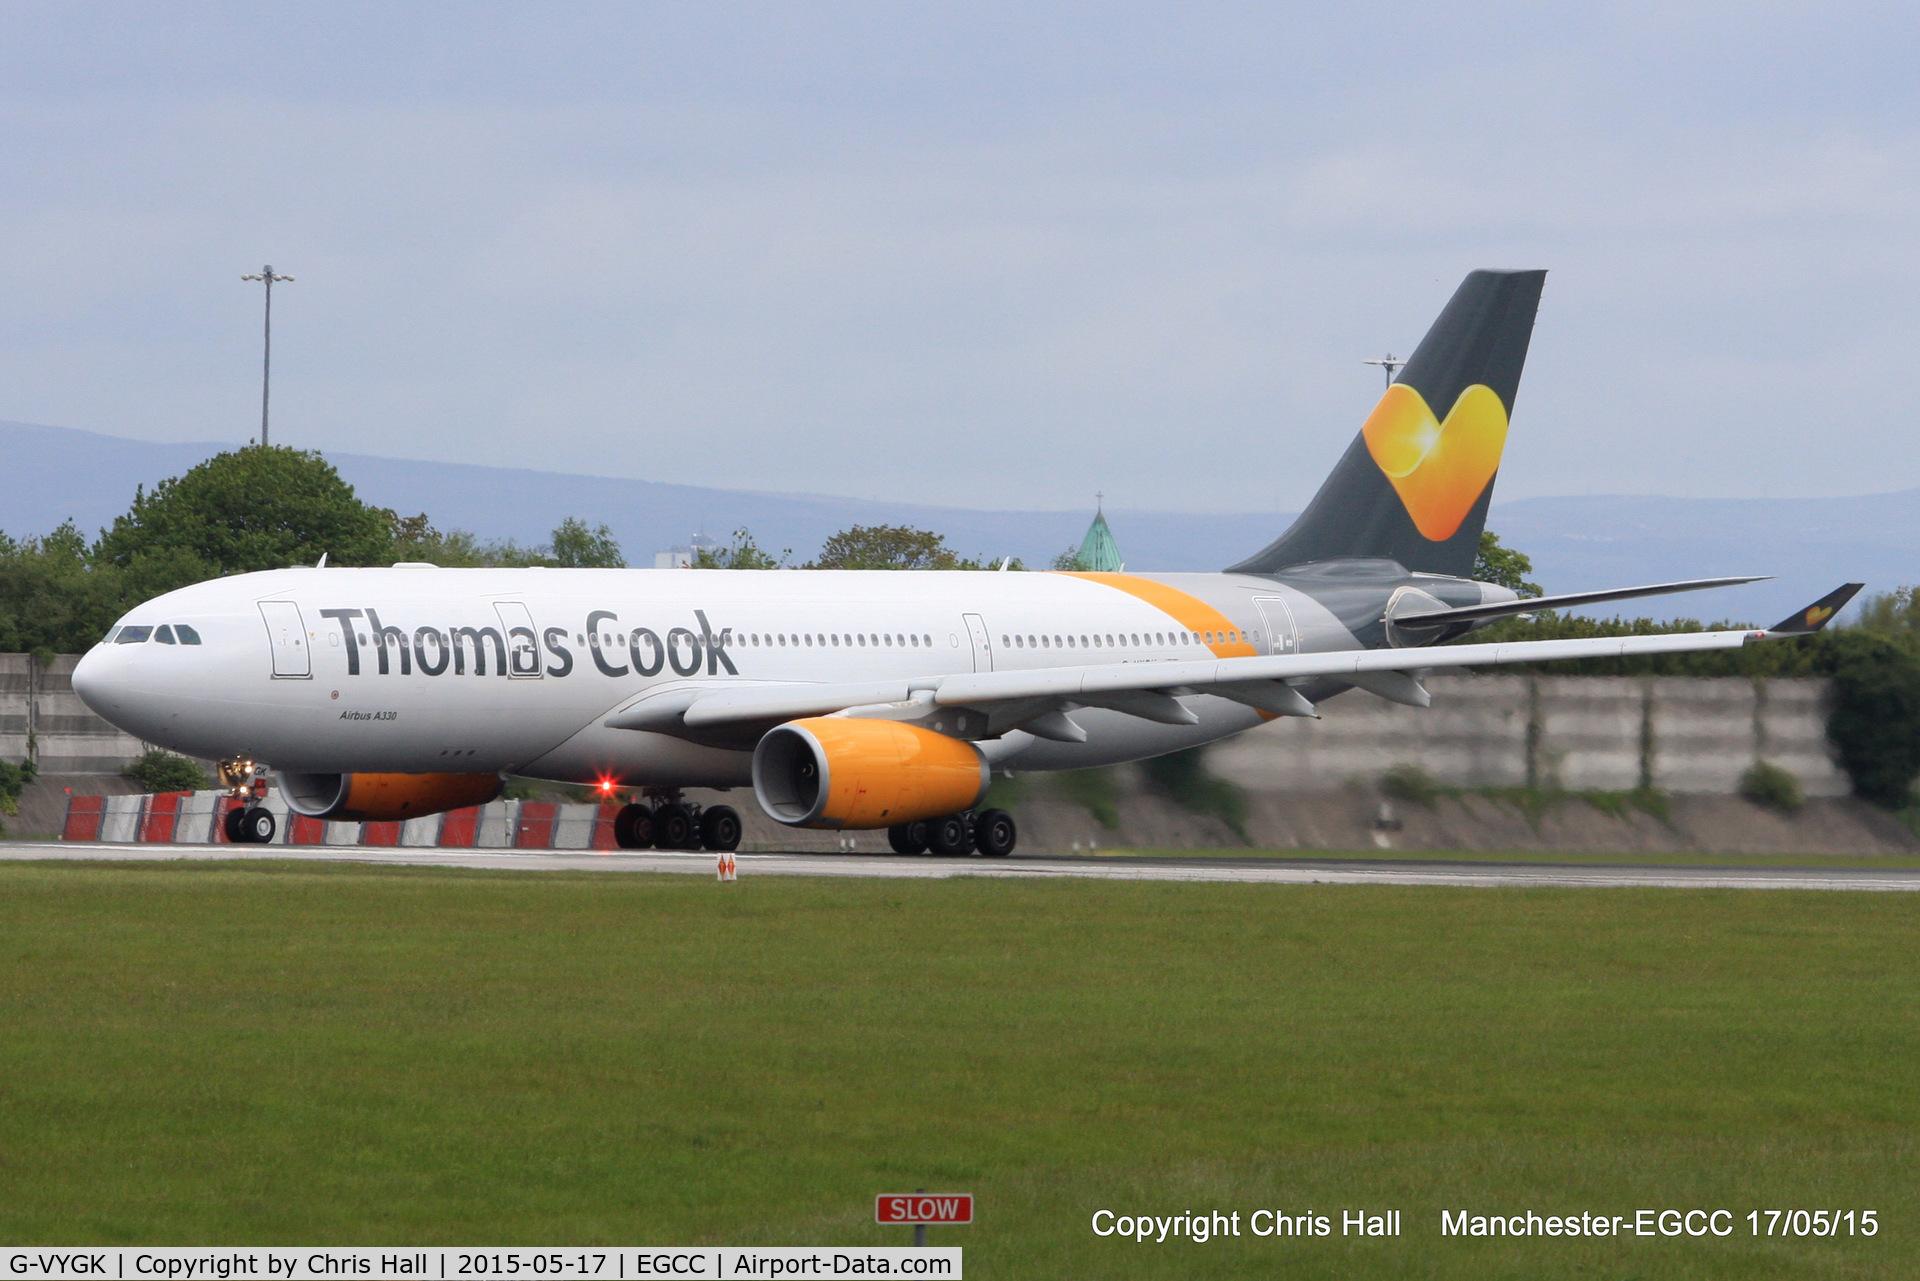 G-VYGK, 2014 Airbus A330-243 C/N 1498, Thomas Cook